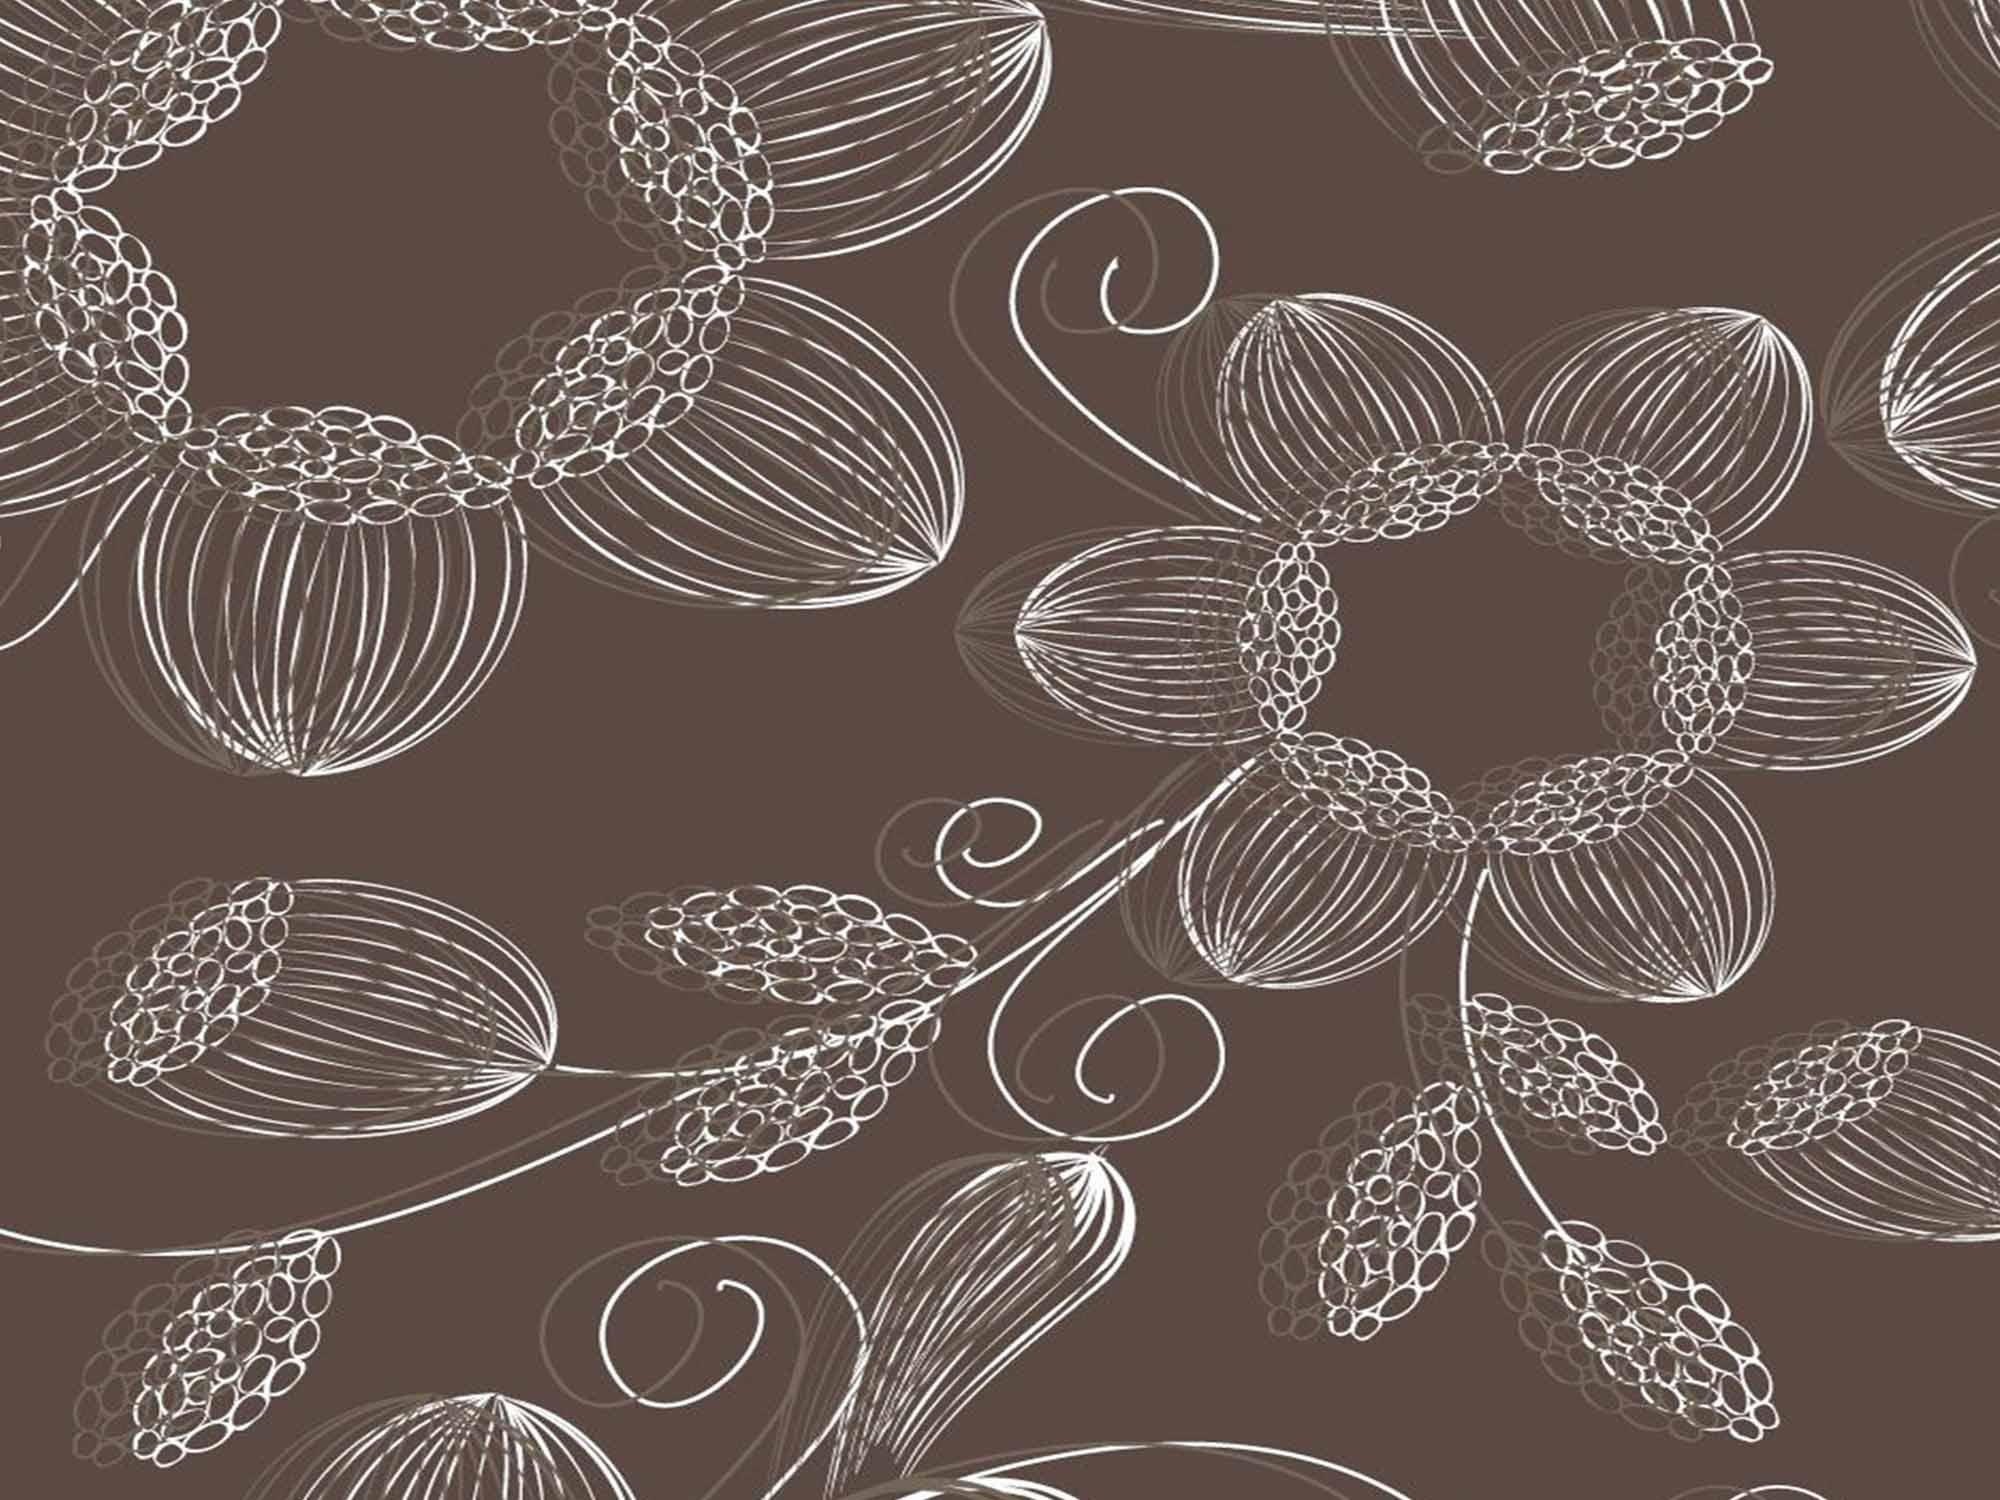 Papel de Parede Floral 0051 - Adesivos de Parede  - Paredes Decoradas